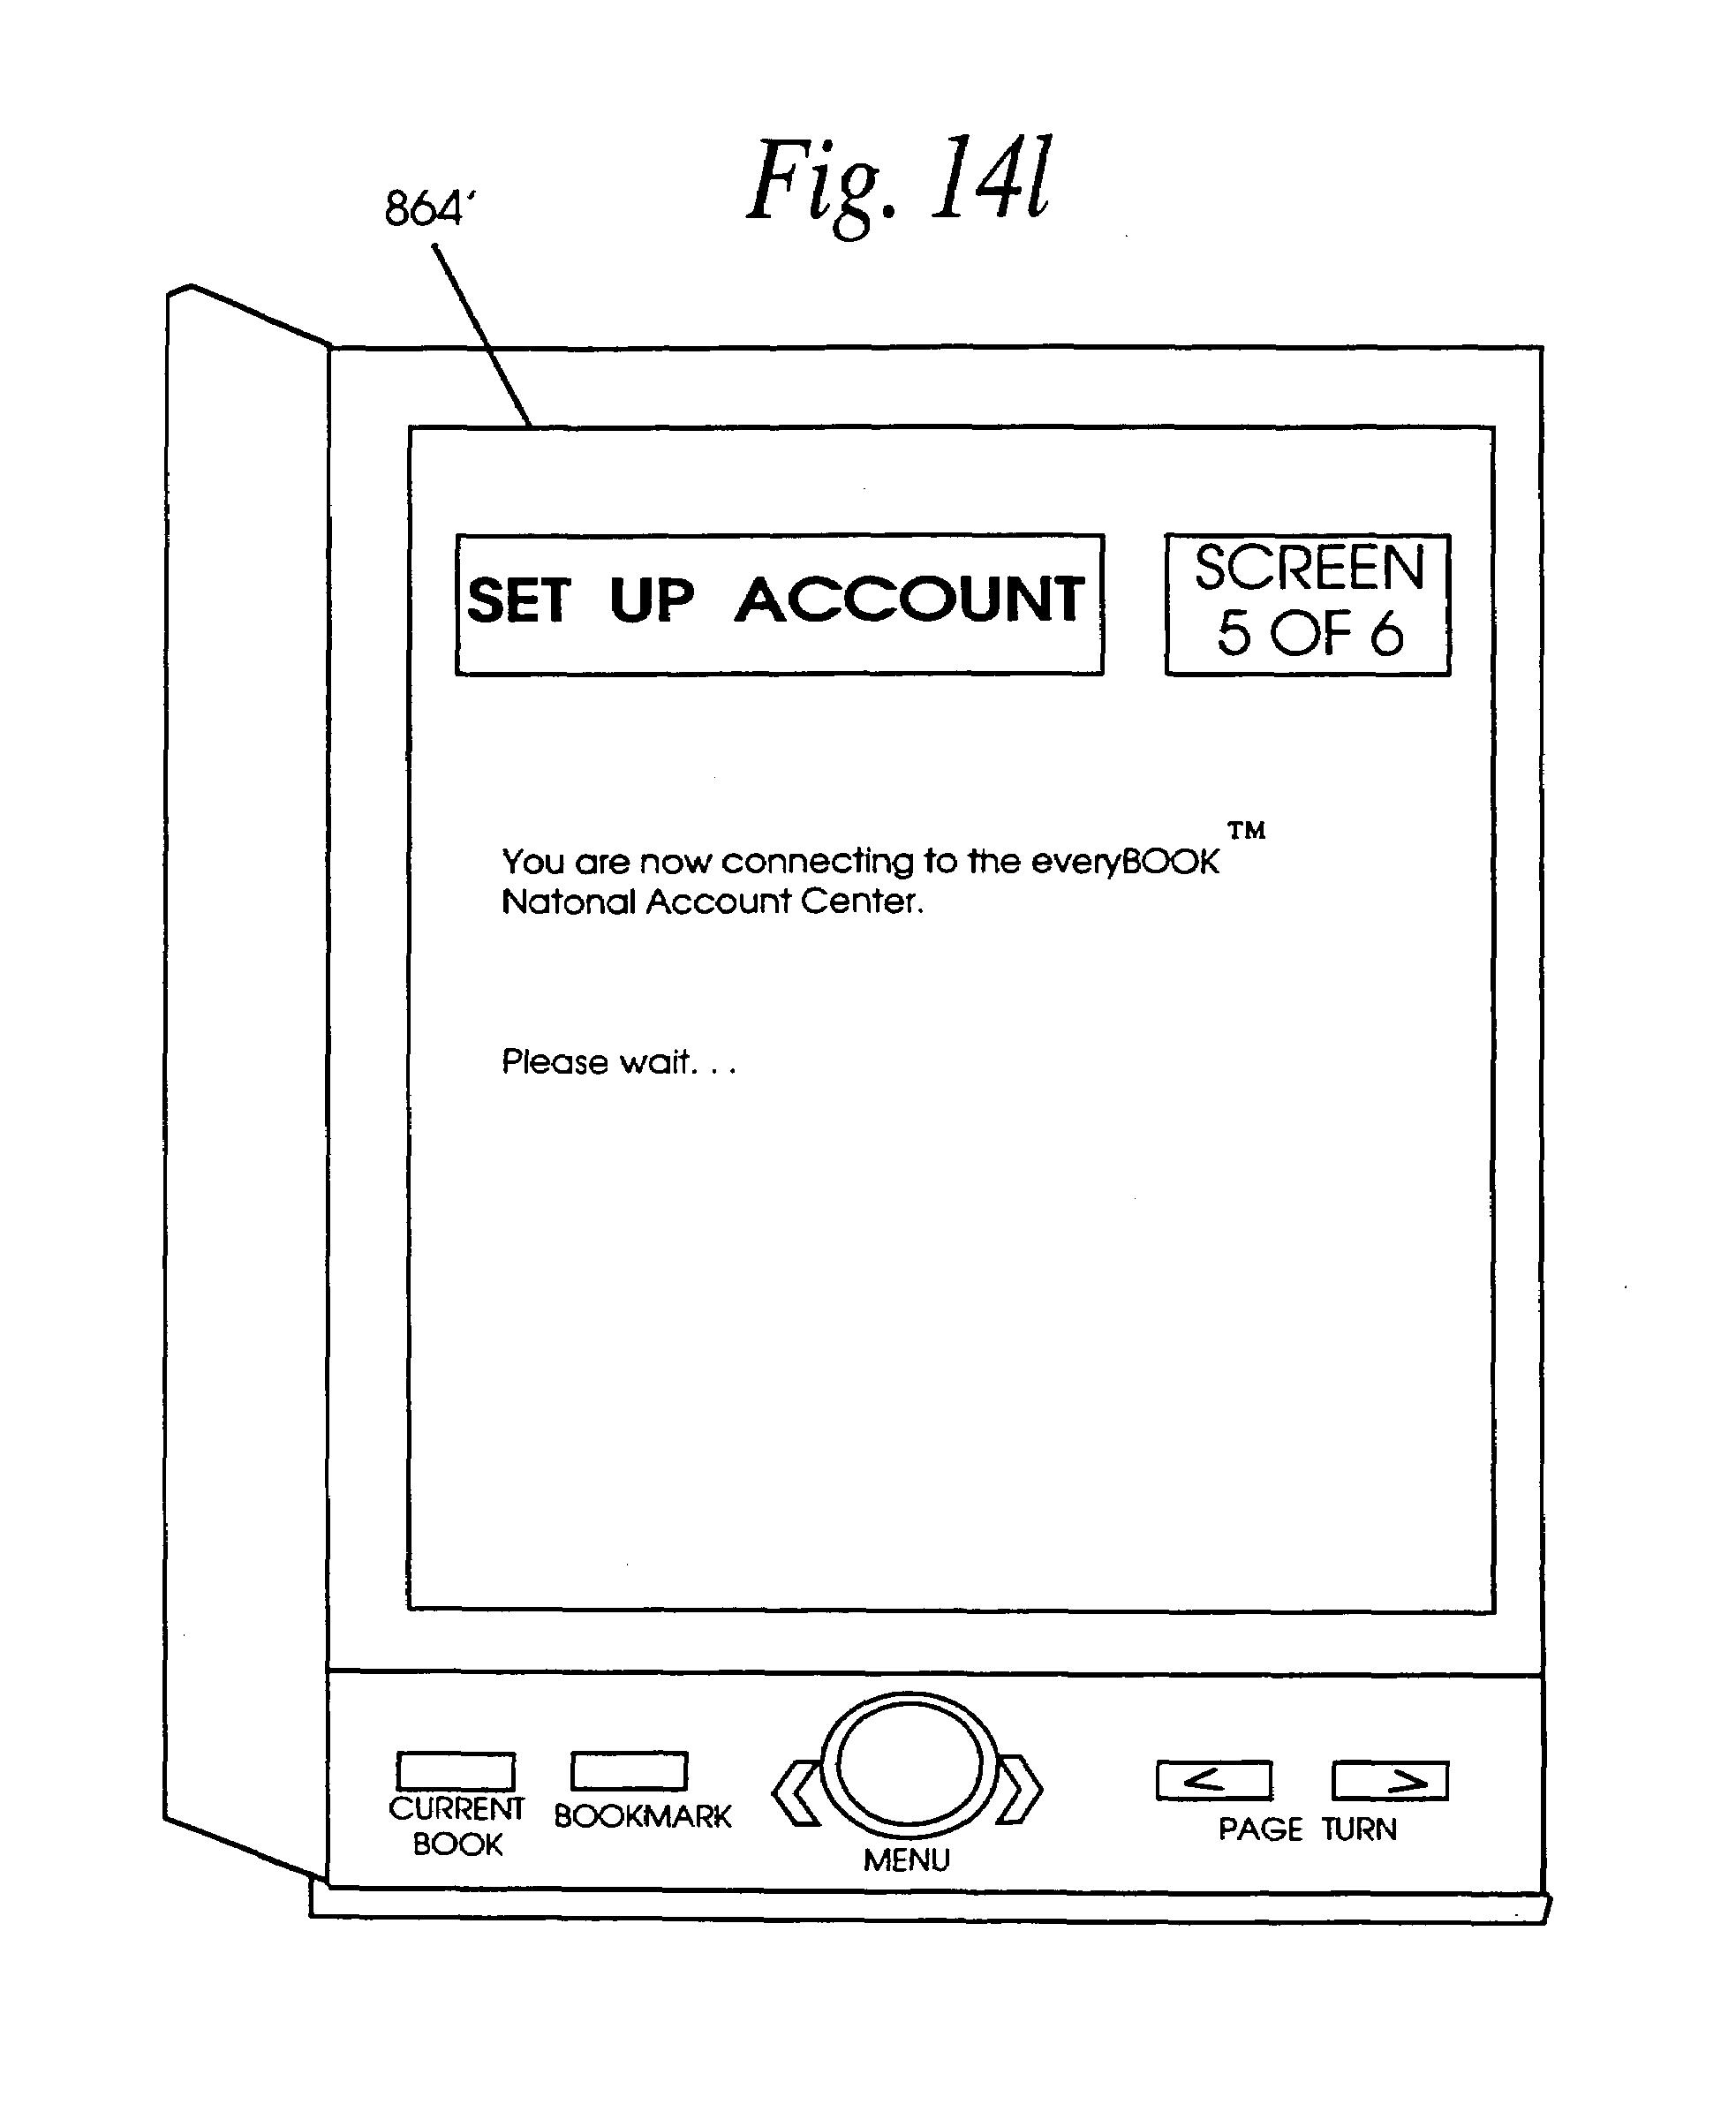 Patent US 7,716,349 B1